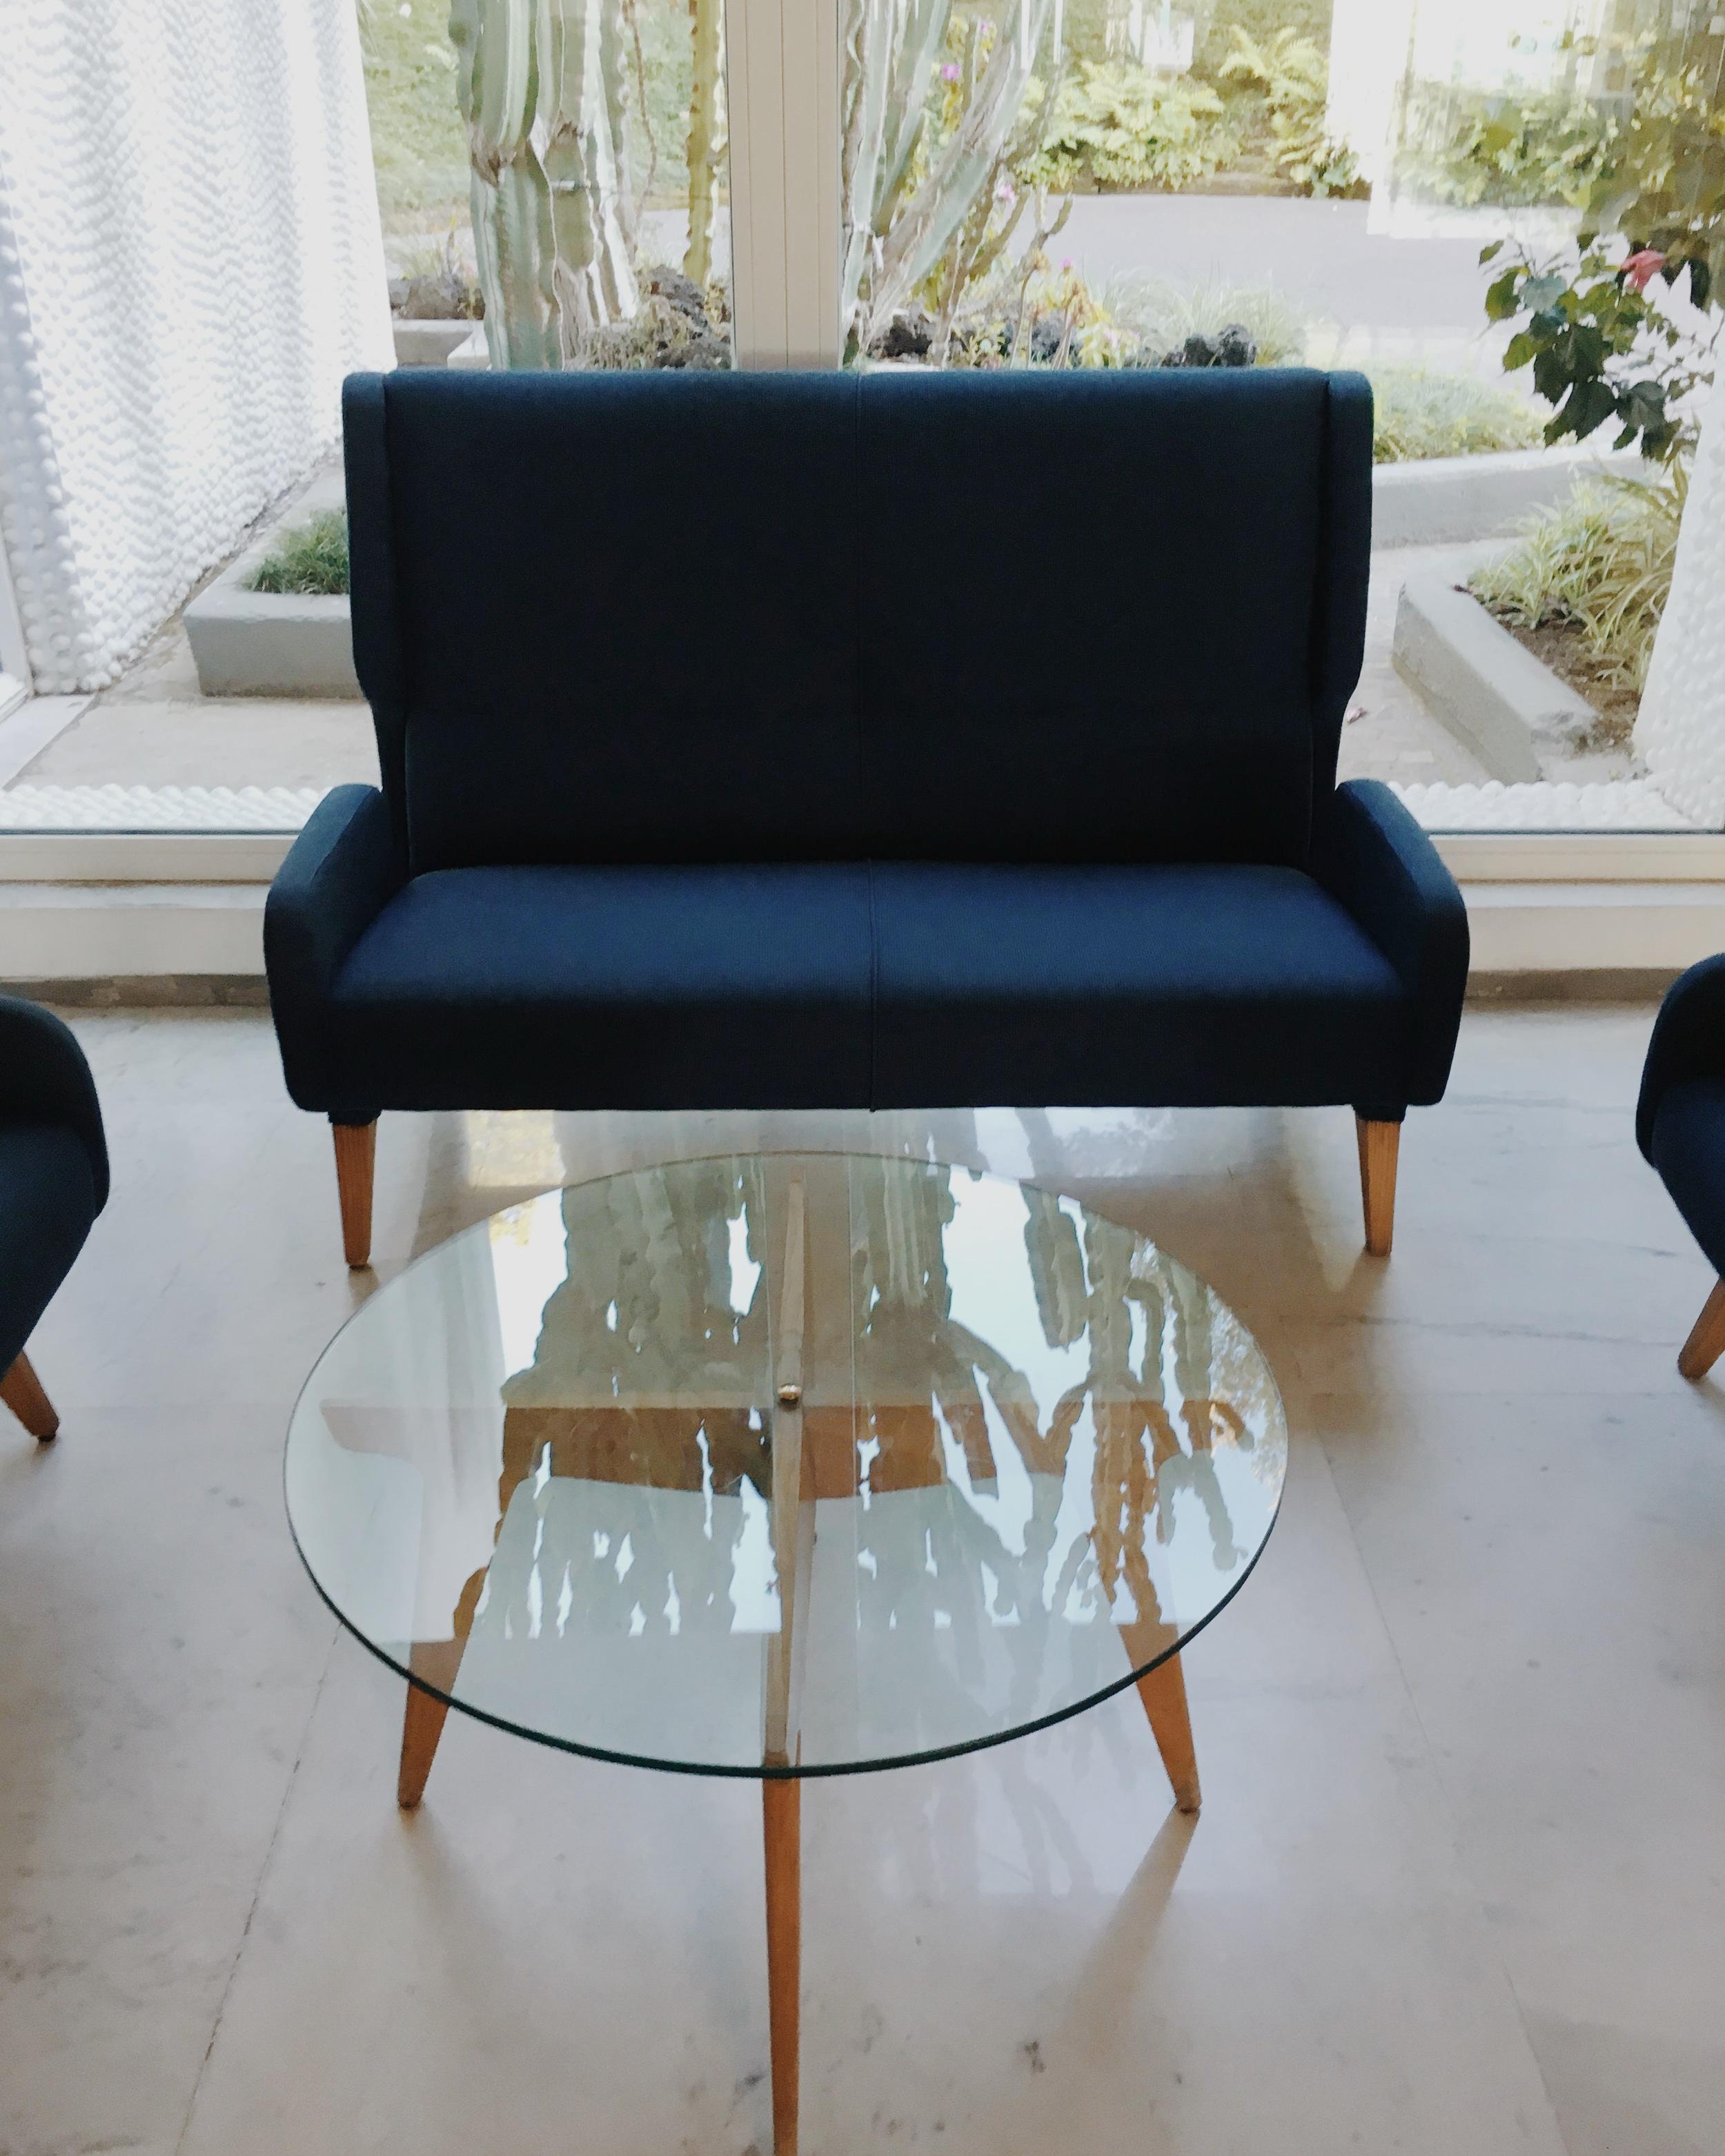 Sofa and Compass table